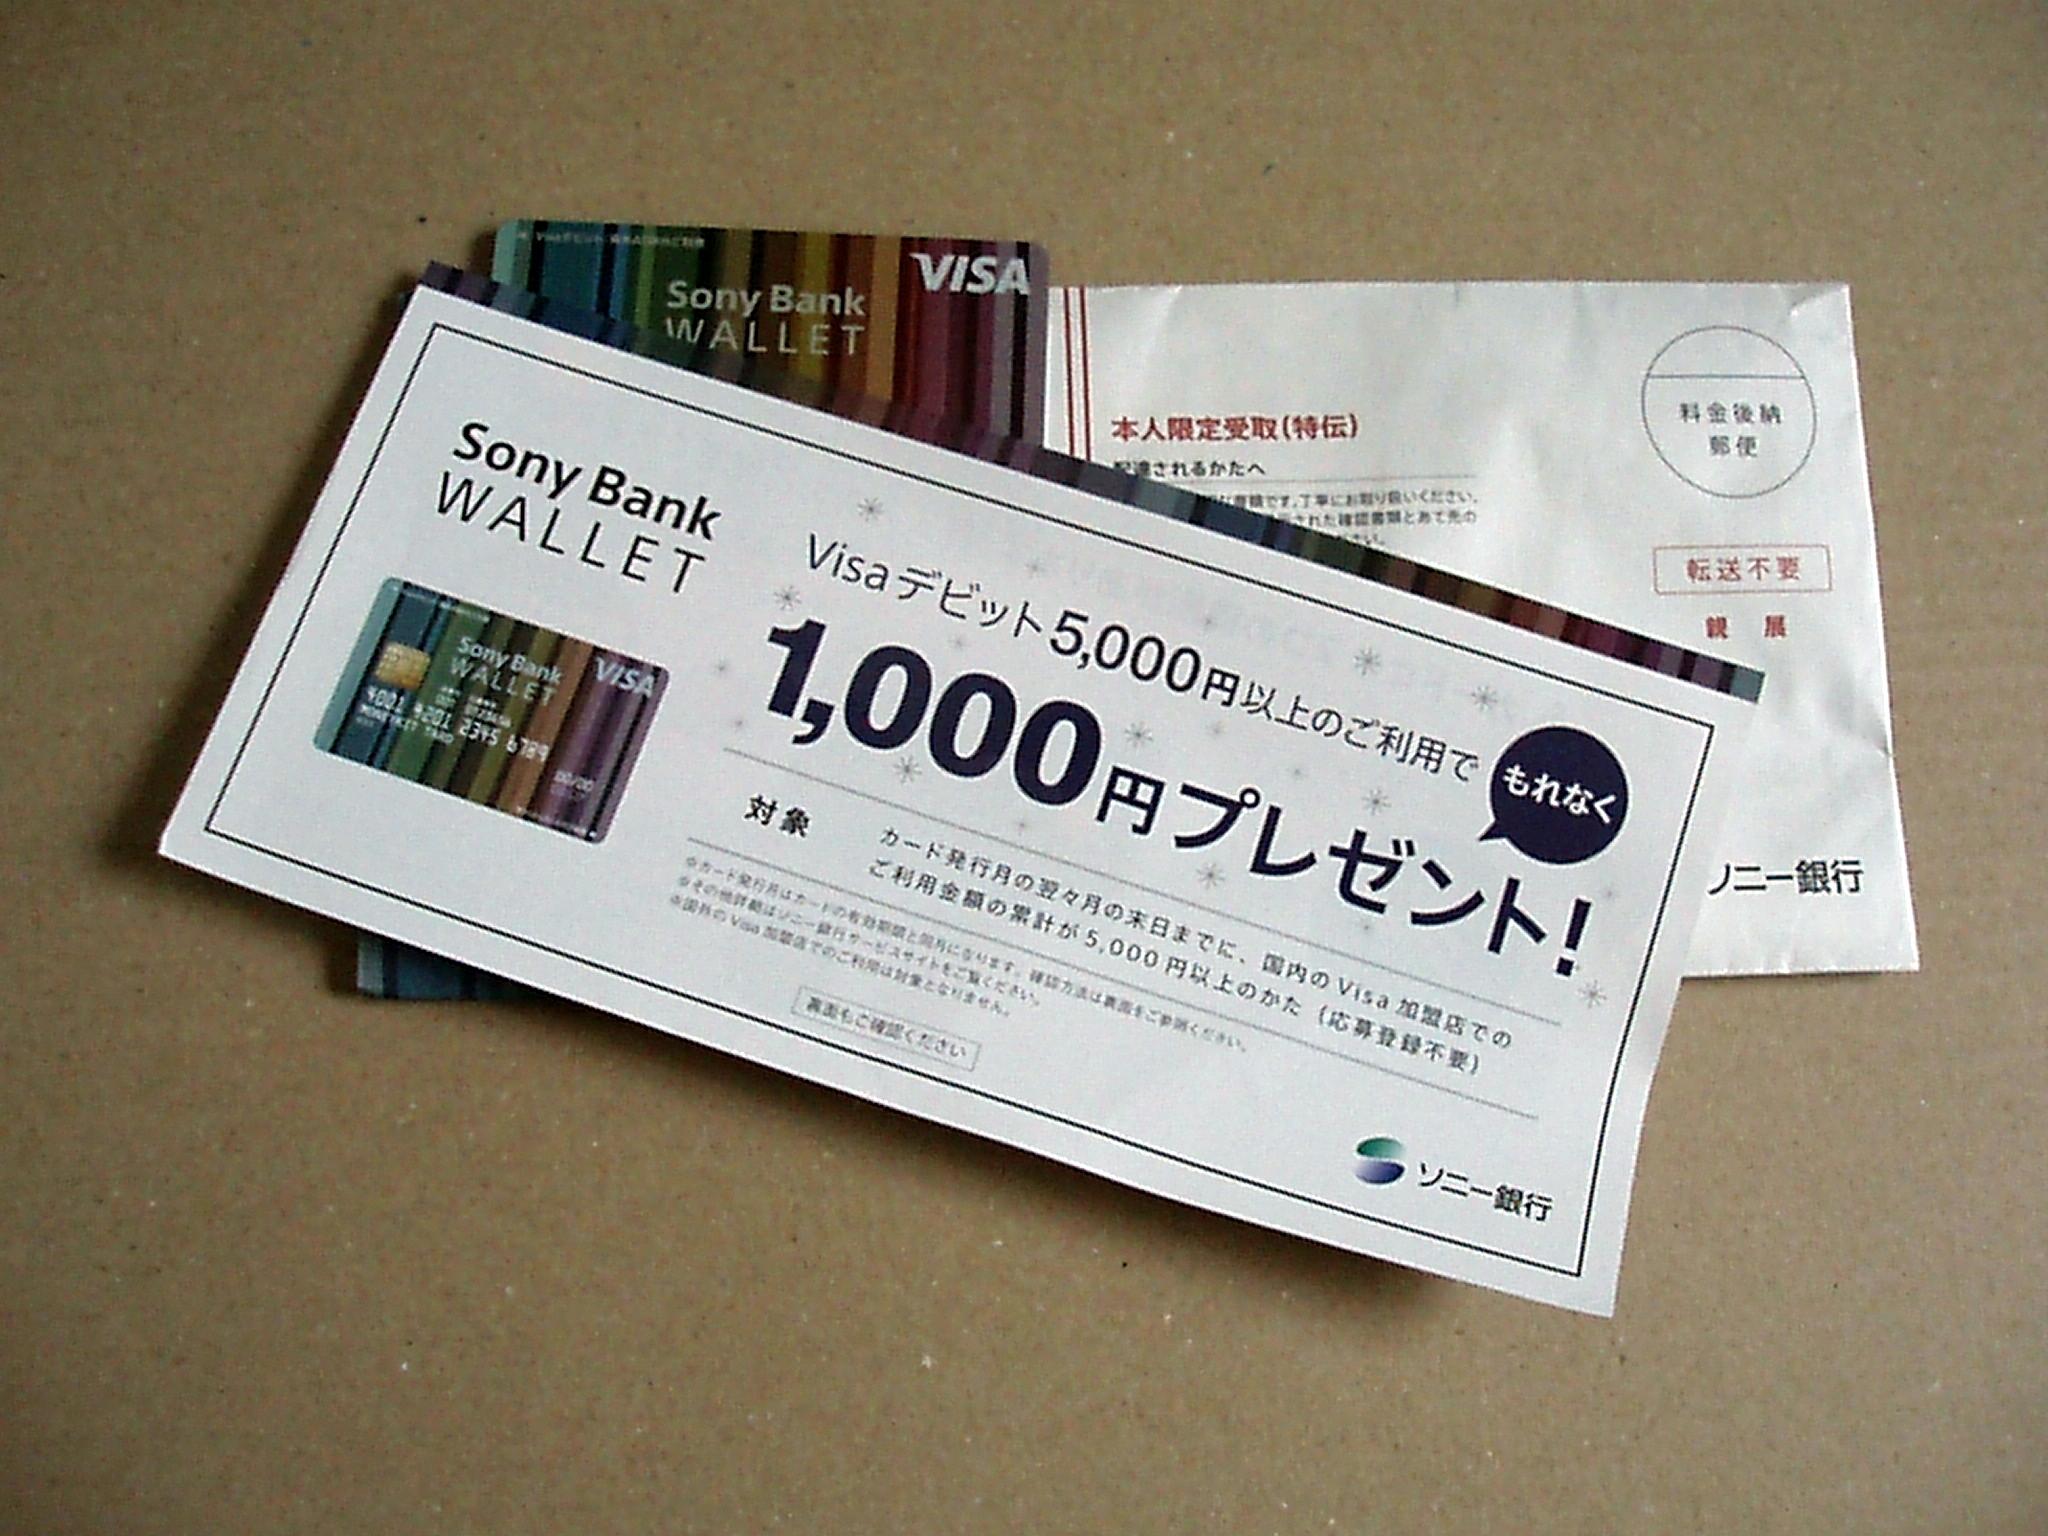 Sony Bank WALLET(Visaデビットカード)MONEYKit ソニー銀行